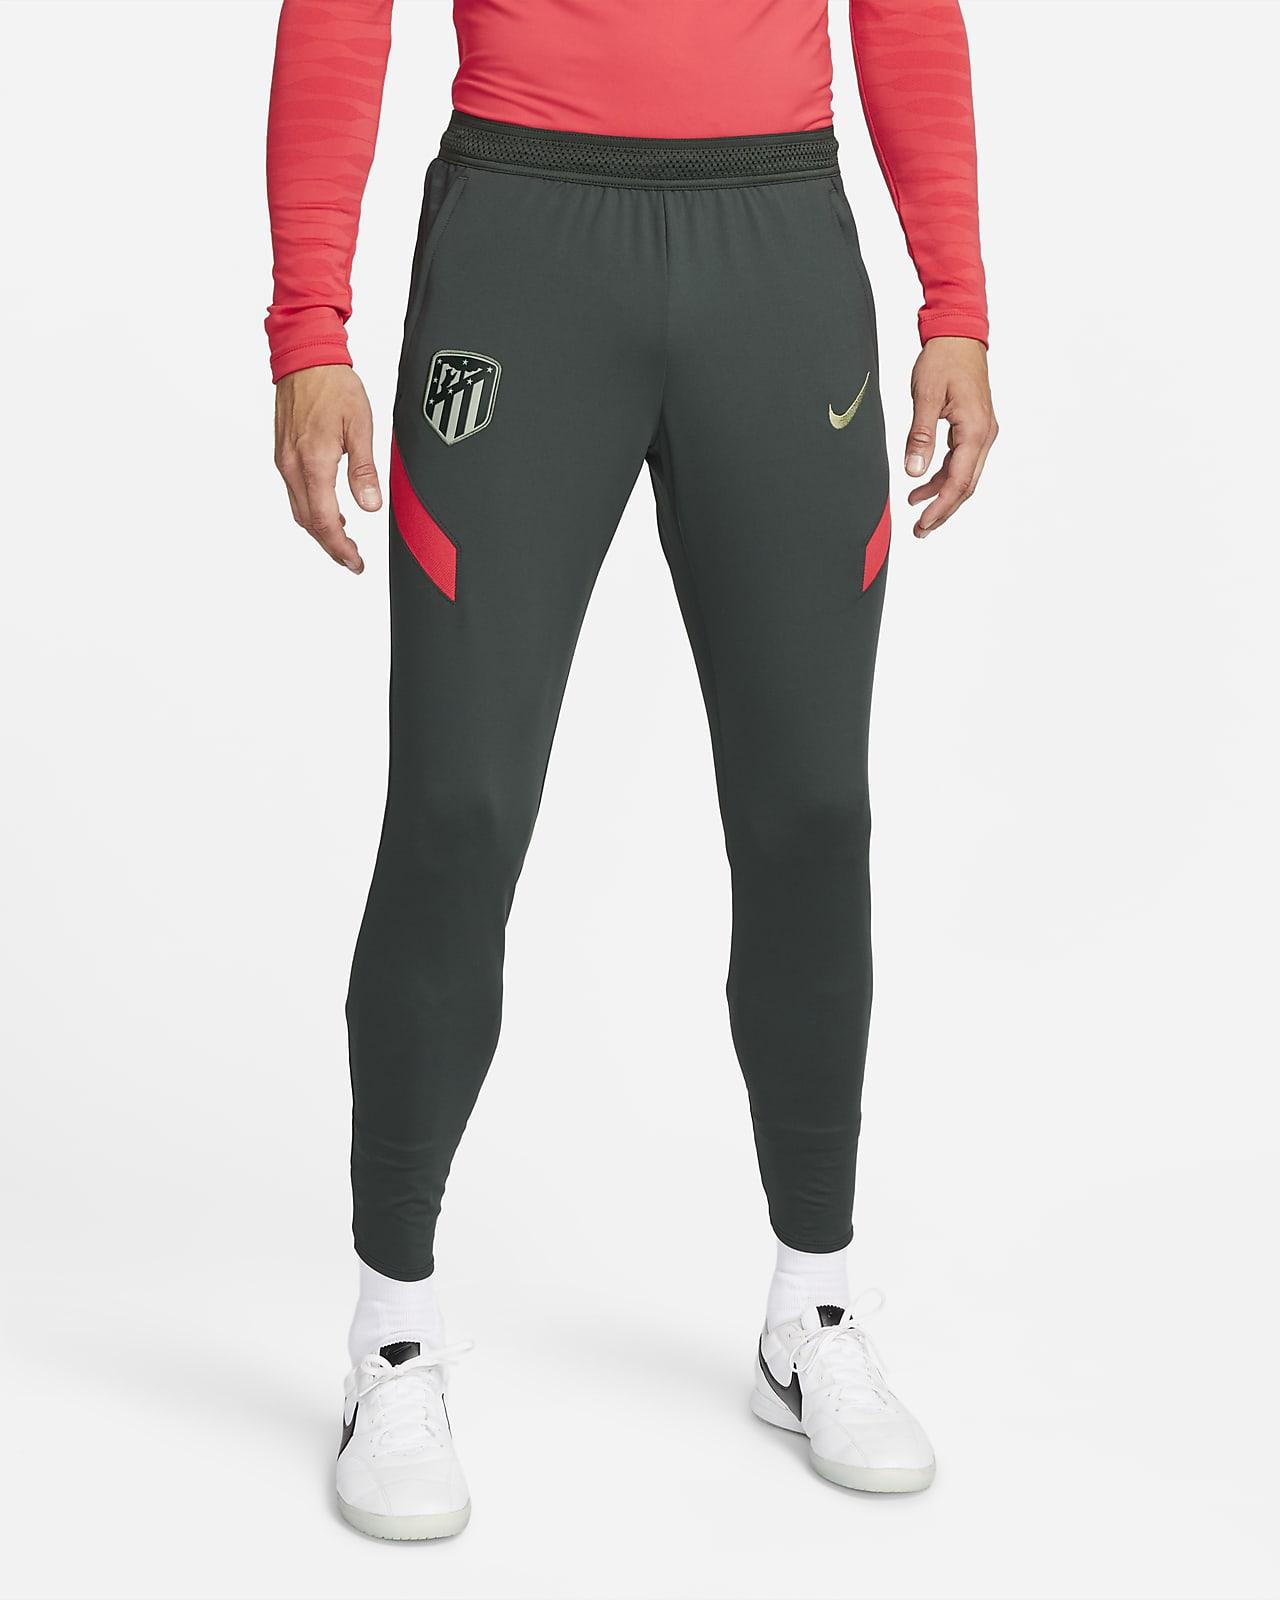 Atlético Madrid Strike Men's Nike Dri-FIT Knit Football Shorts